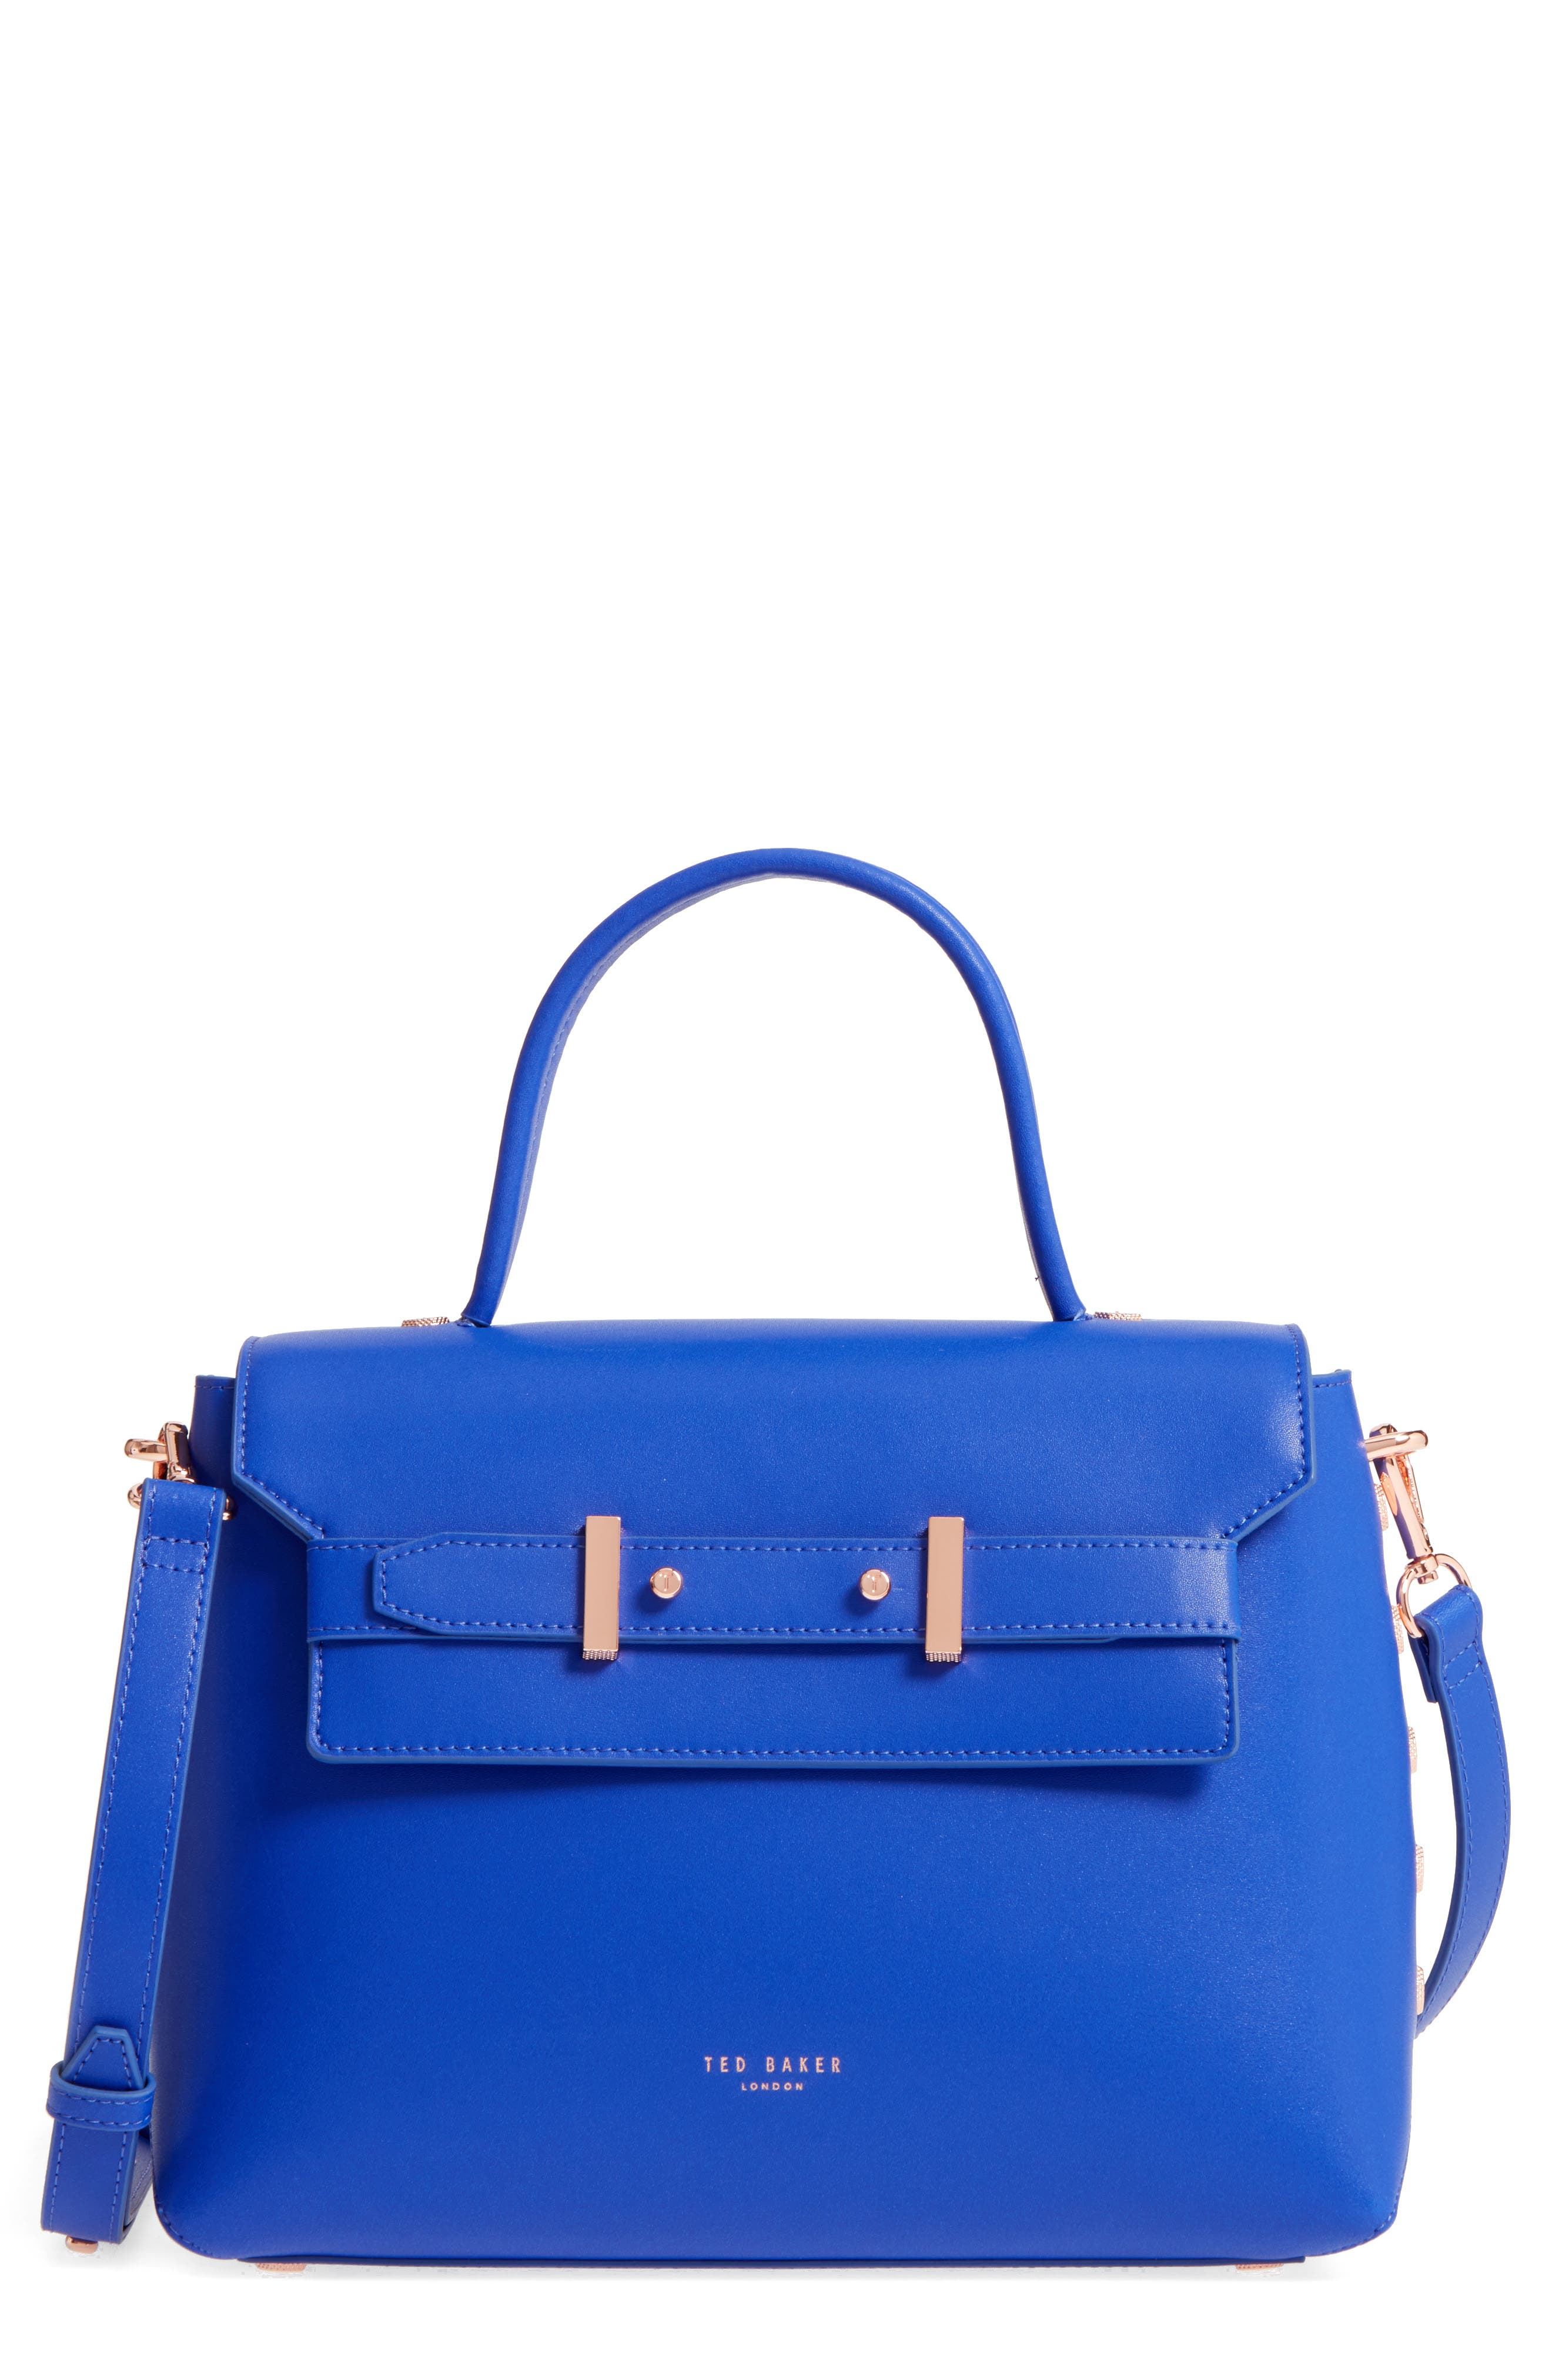 Main Image - Ted Baker London Taymar - Studded Edge Lady Bag Leather Top Handle Satchel